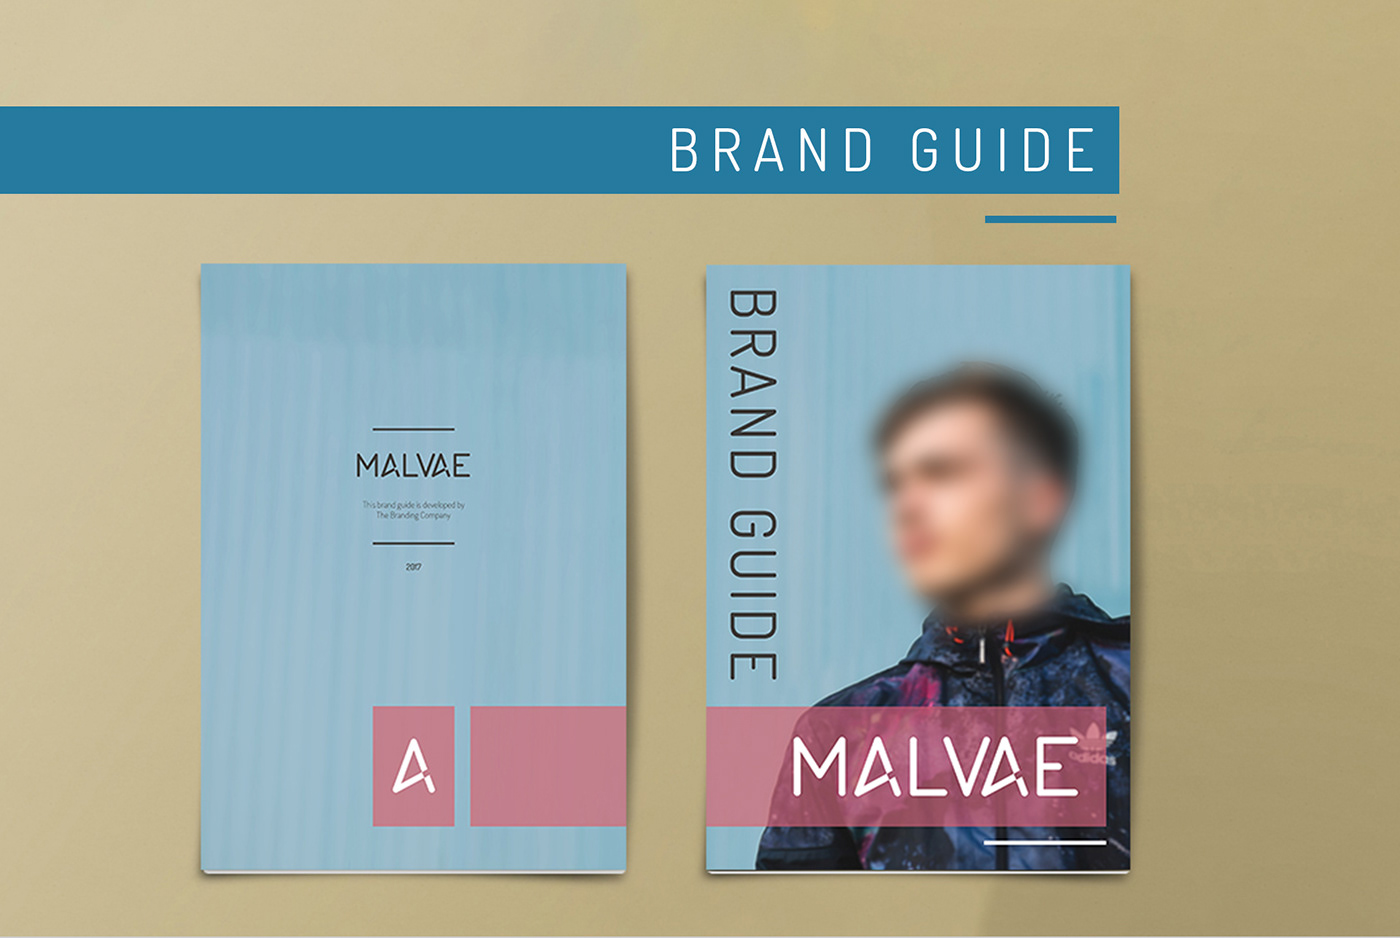 branding  Website brand guide buisiness card logo graphic design  web development  Web Design  Corporate Identity design